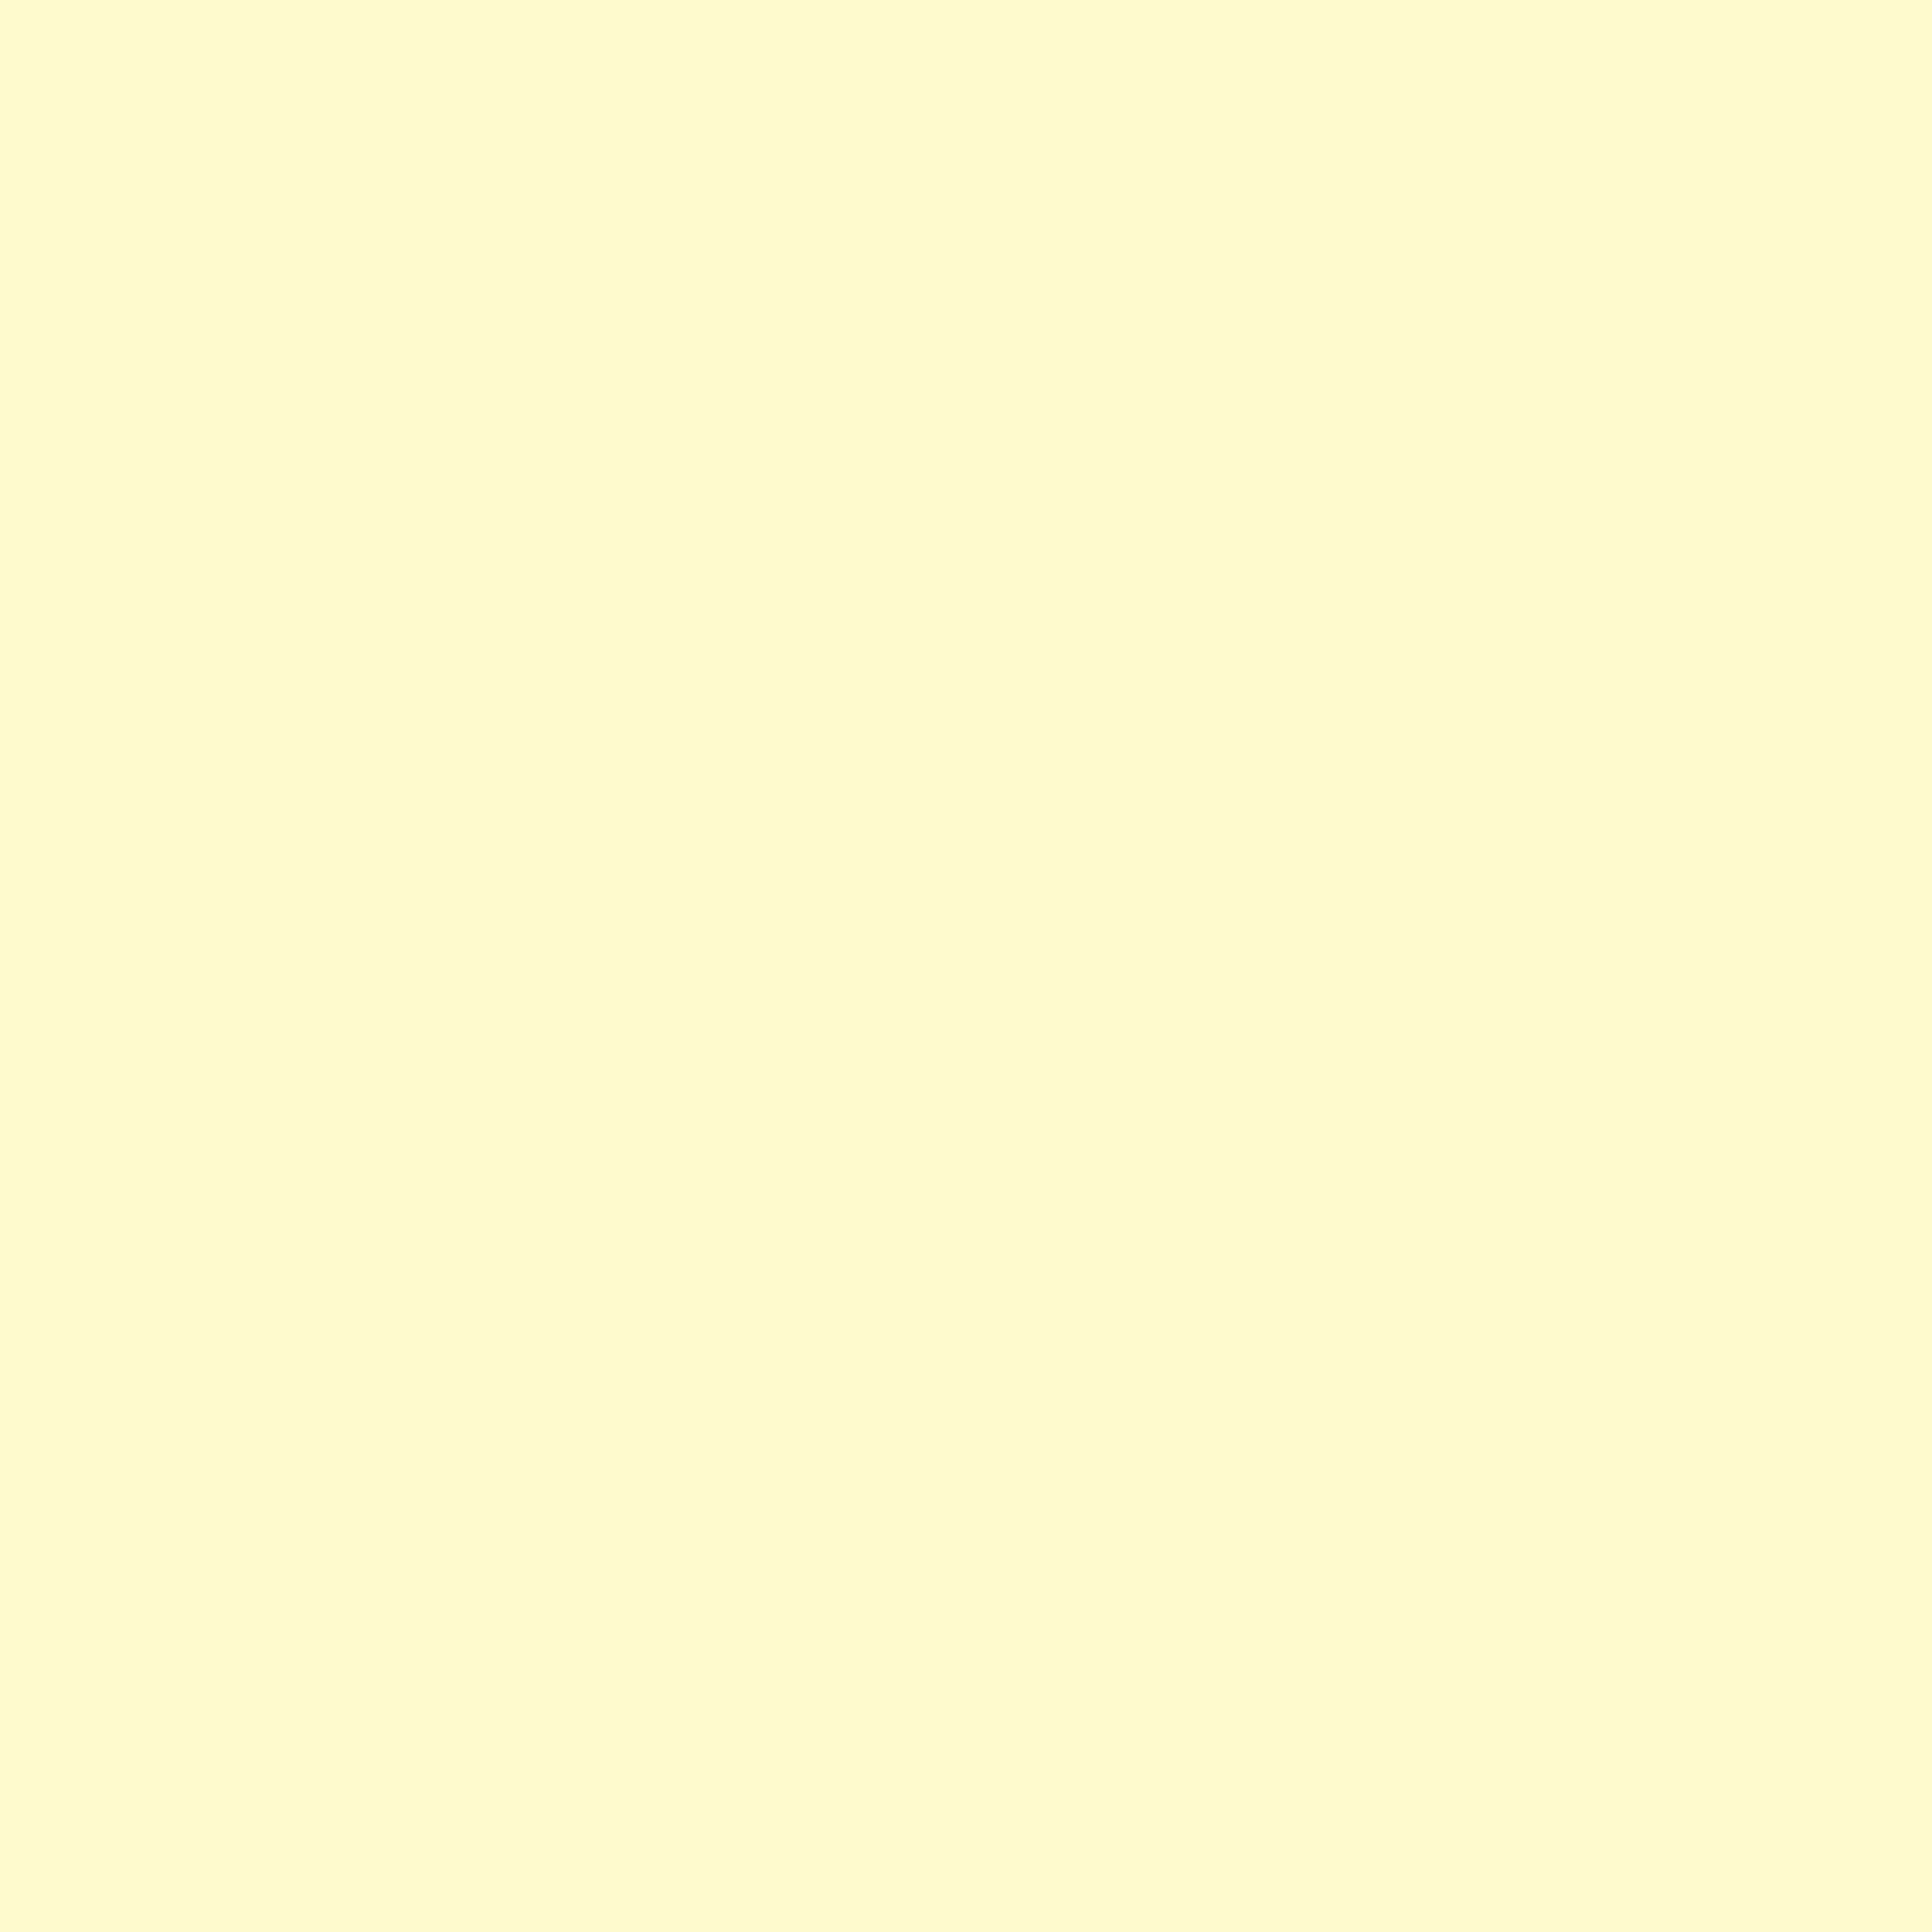 2732x2732 Lemon Chiffon Solid Color Background